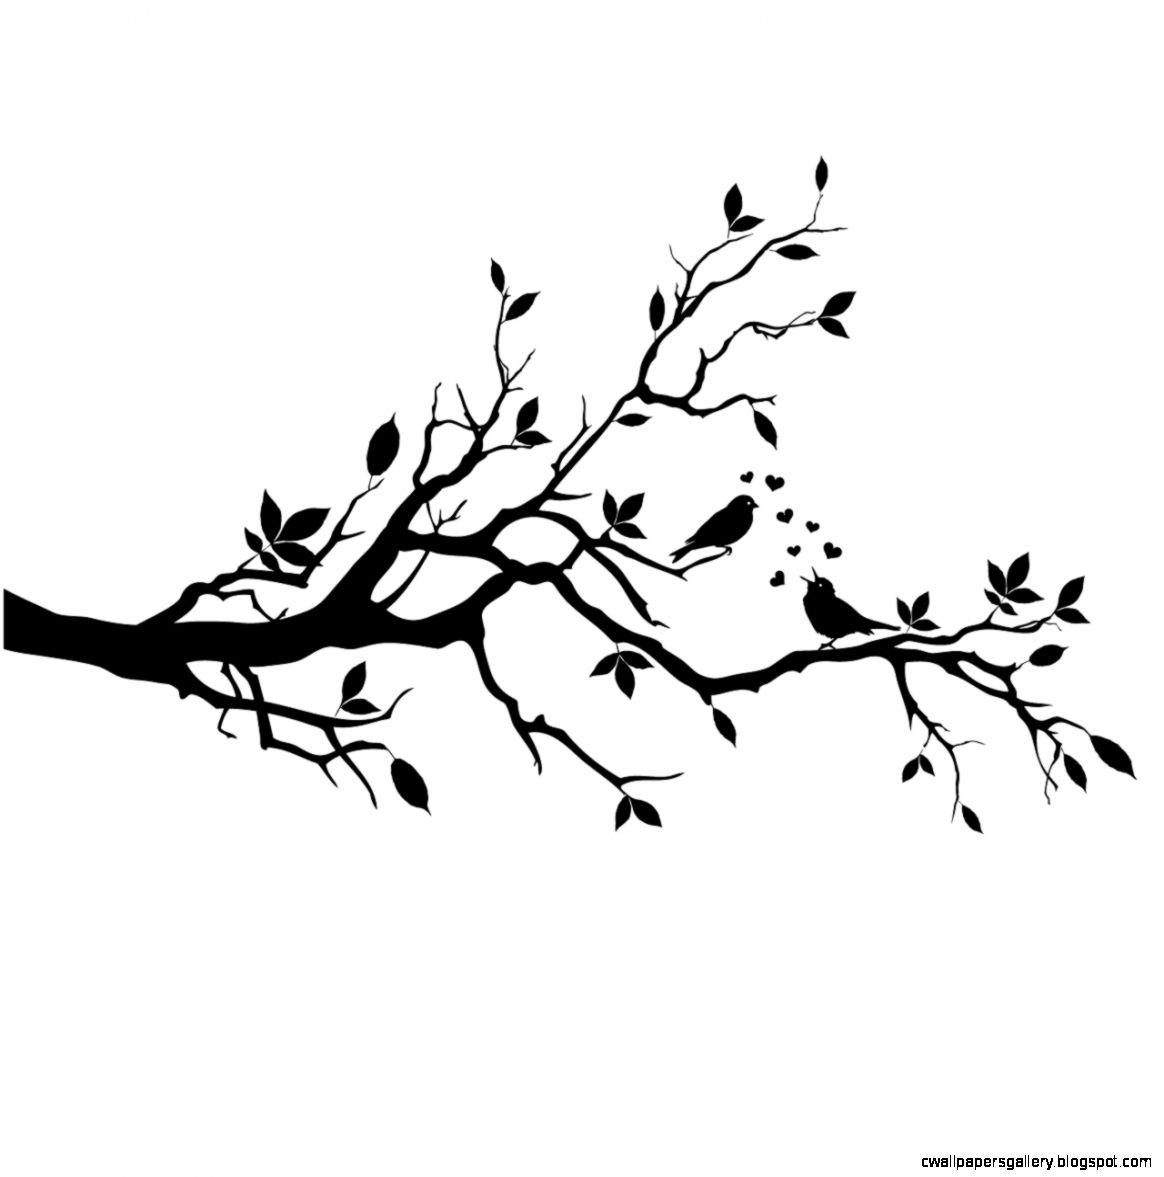 Love Birds On Branch Silhouette